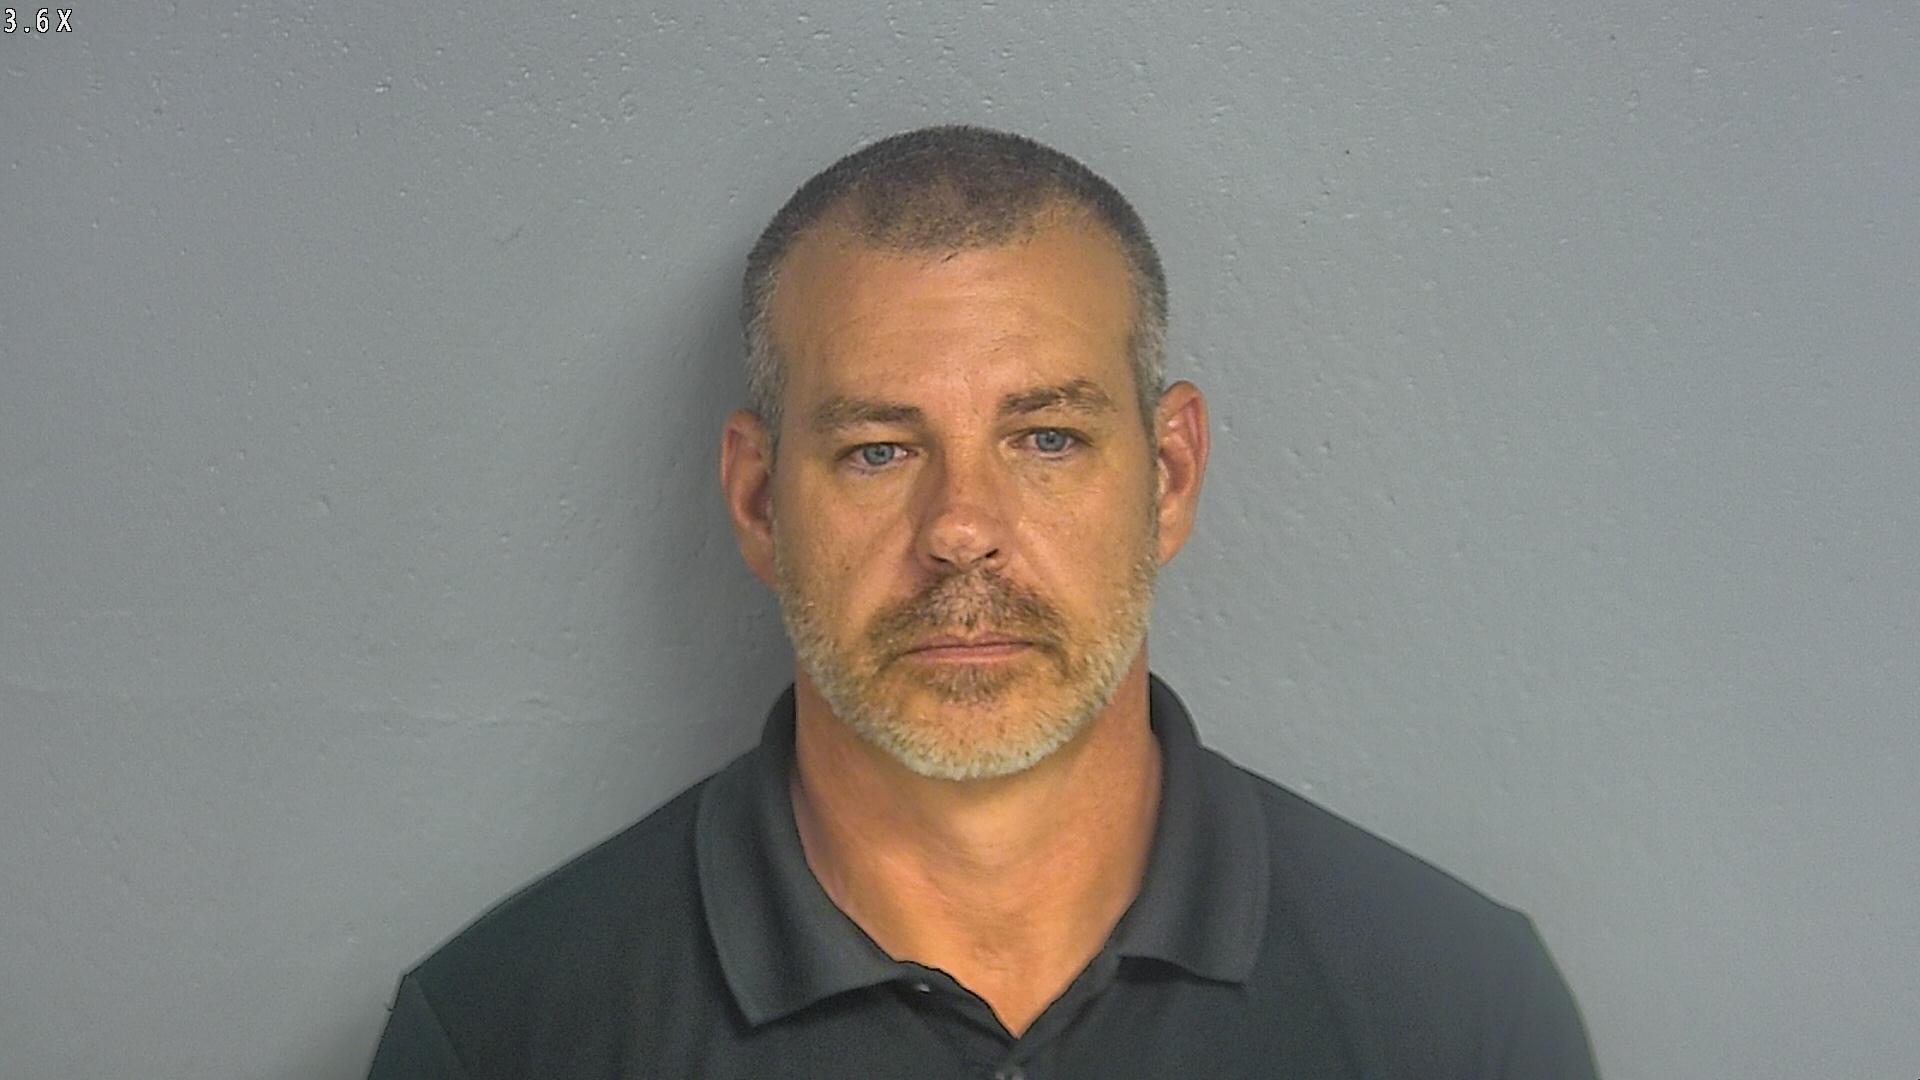 Texas County Sheriff JAMES SIGMAN MUG_1532022081608.jpg.jpg